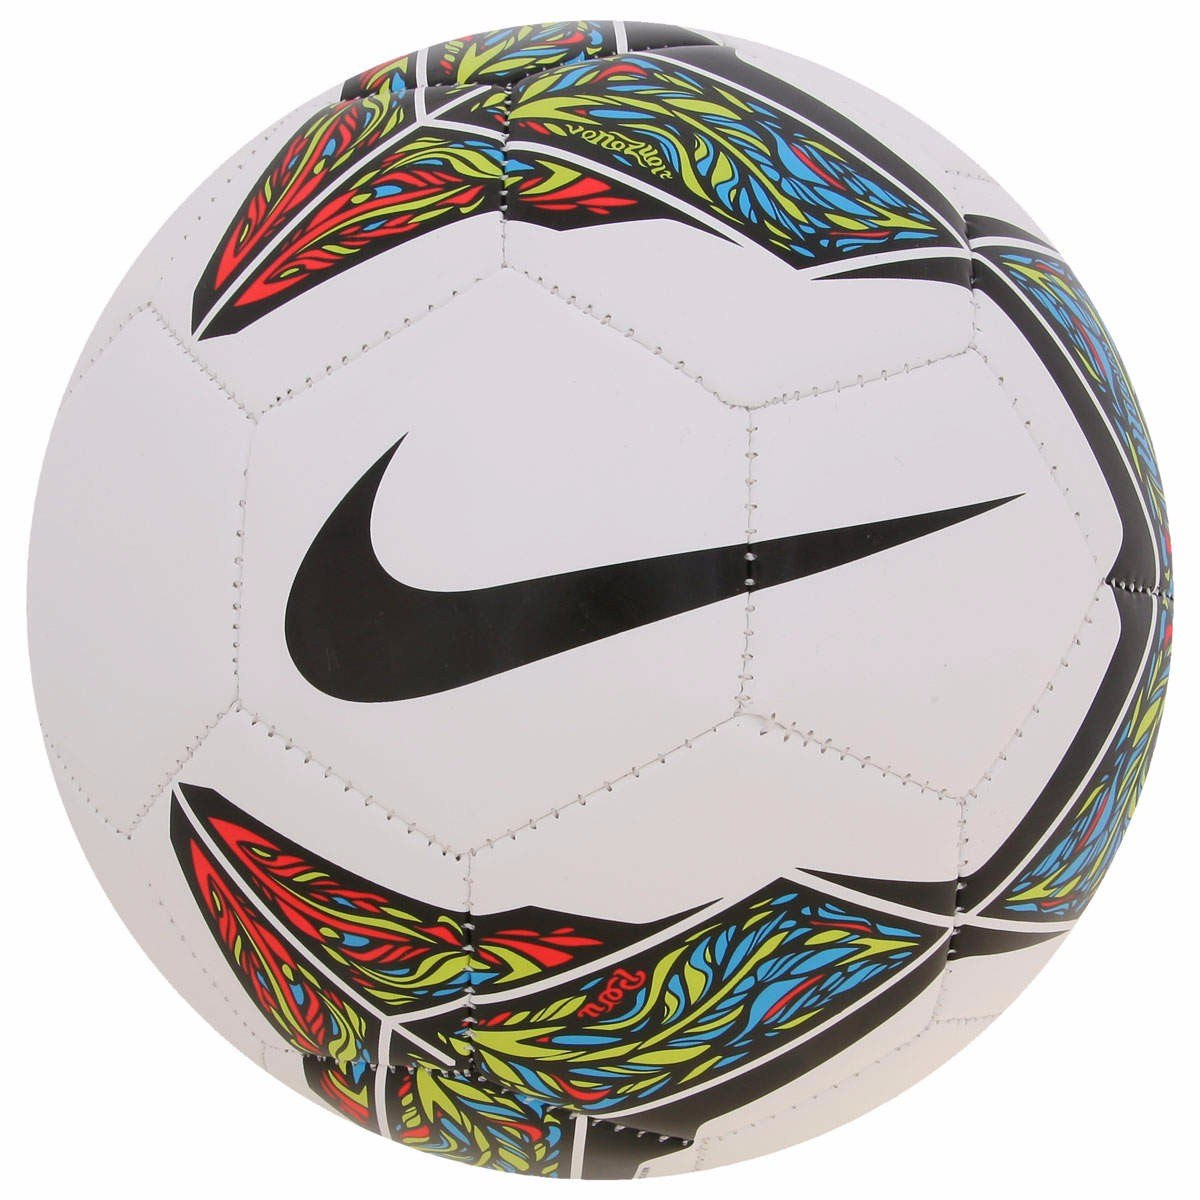 461f99fb3103d bola de futsal nike rolinho menor csf pro original 1magnus. Carregando zoom.